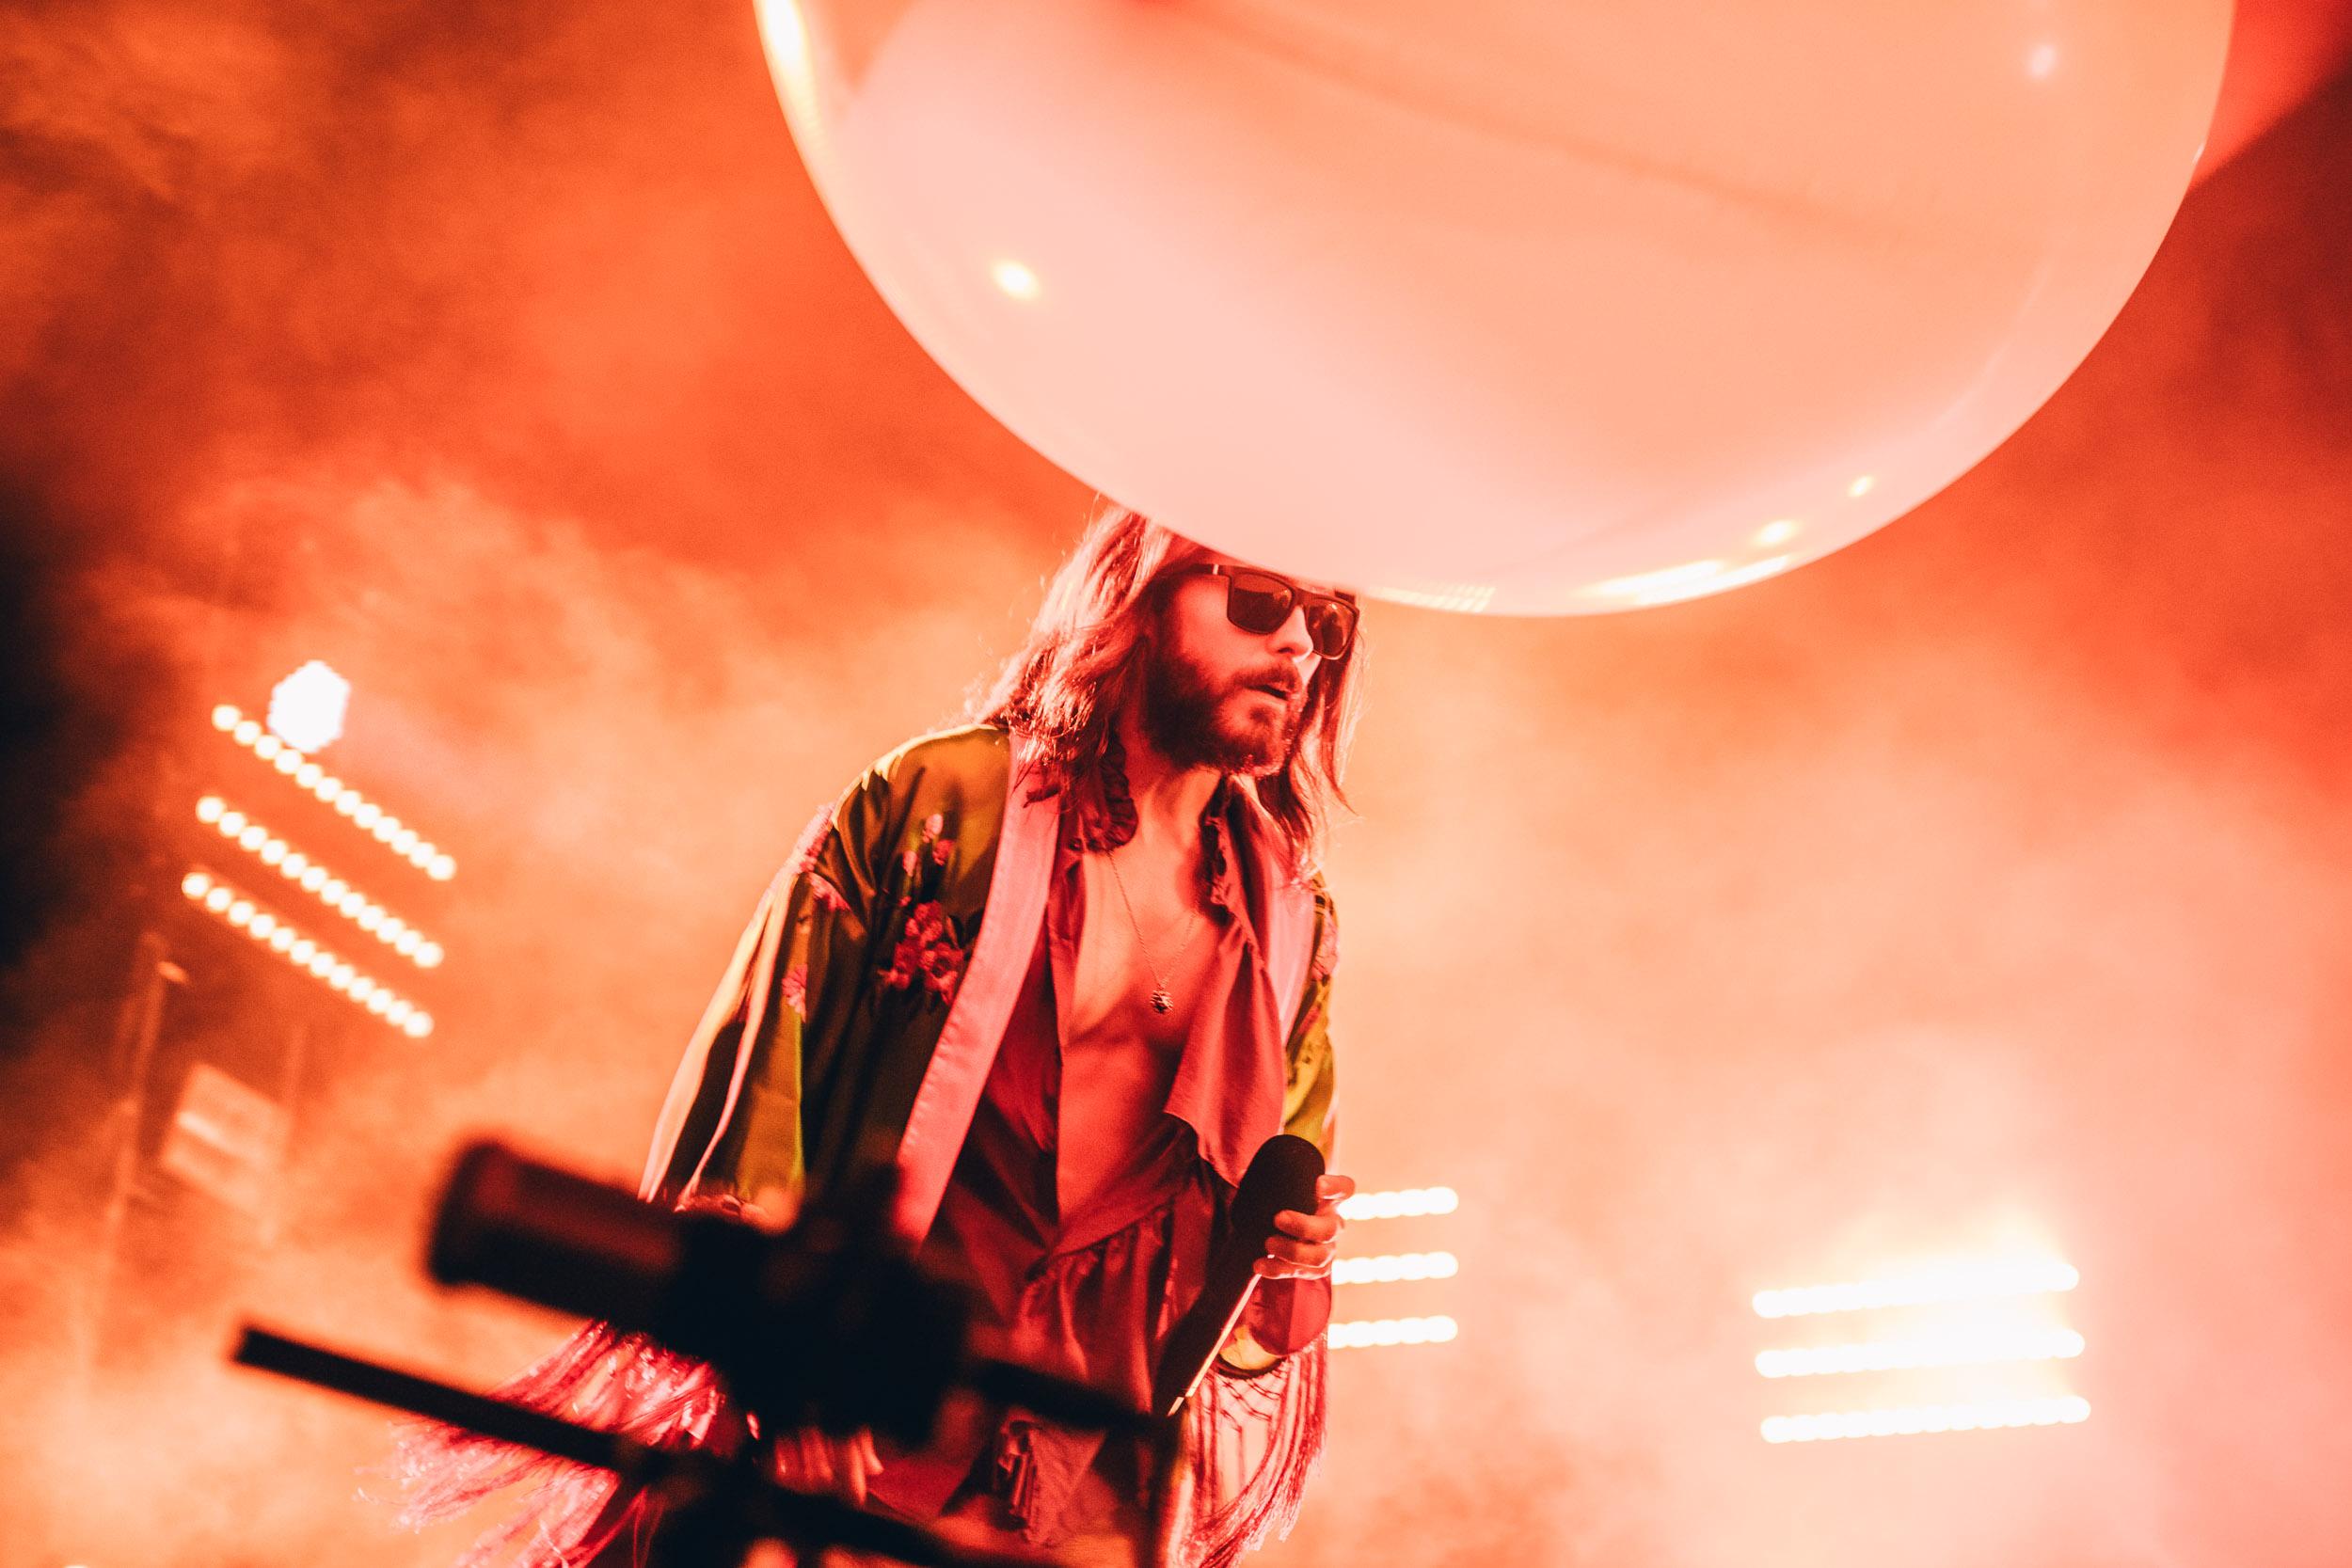 30 Seconds to Mars Altice Arena 20180912-436.jpg